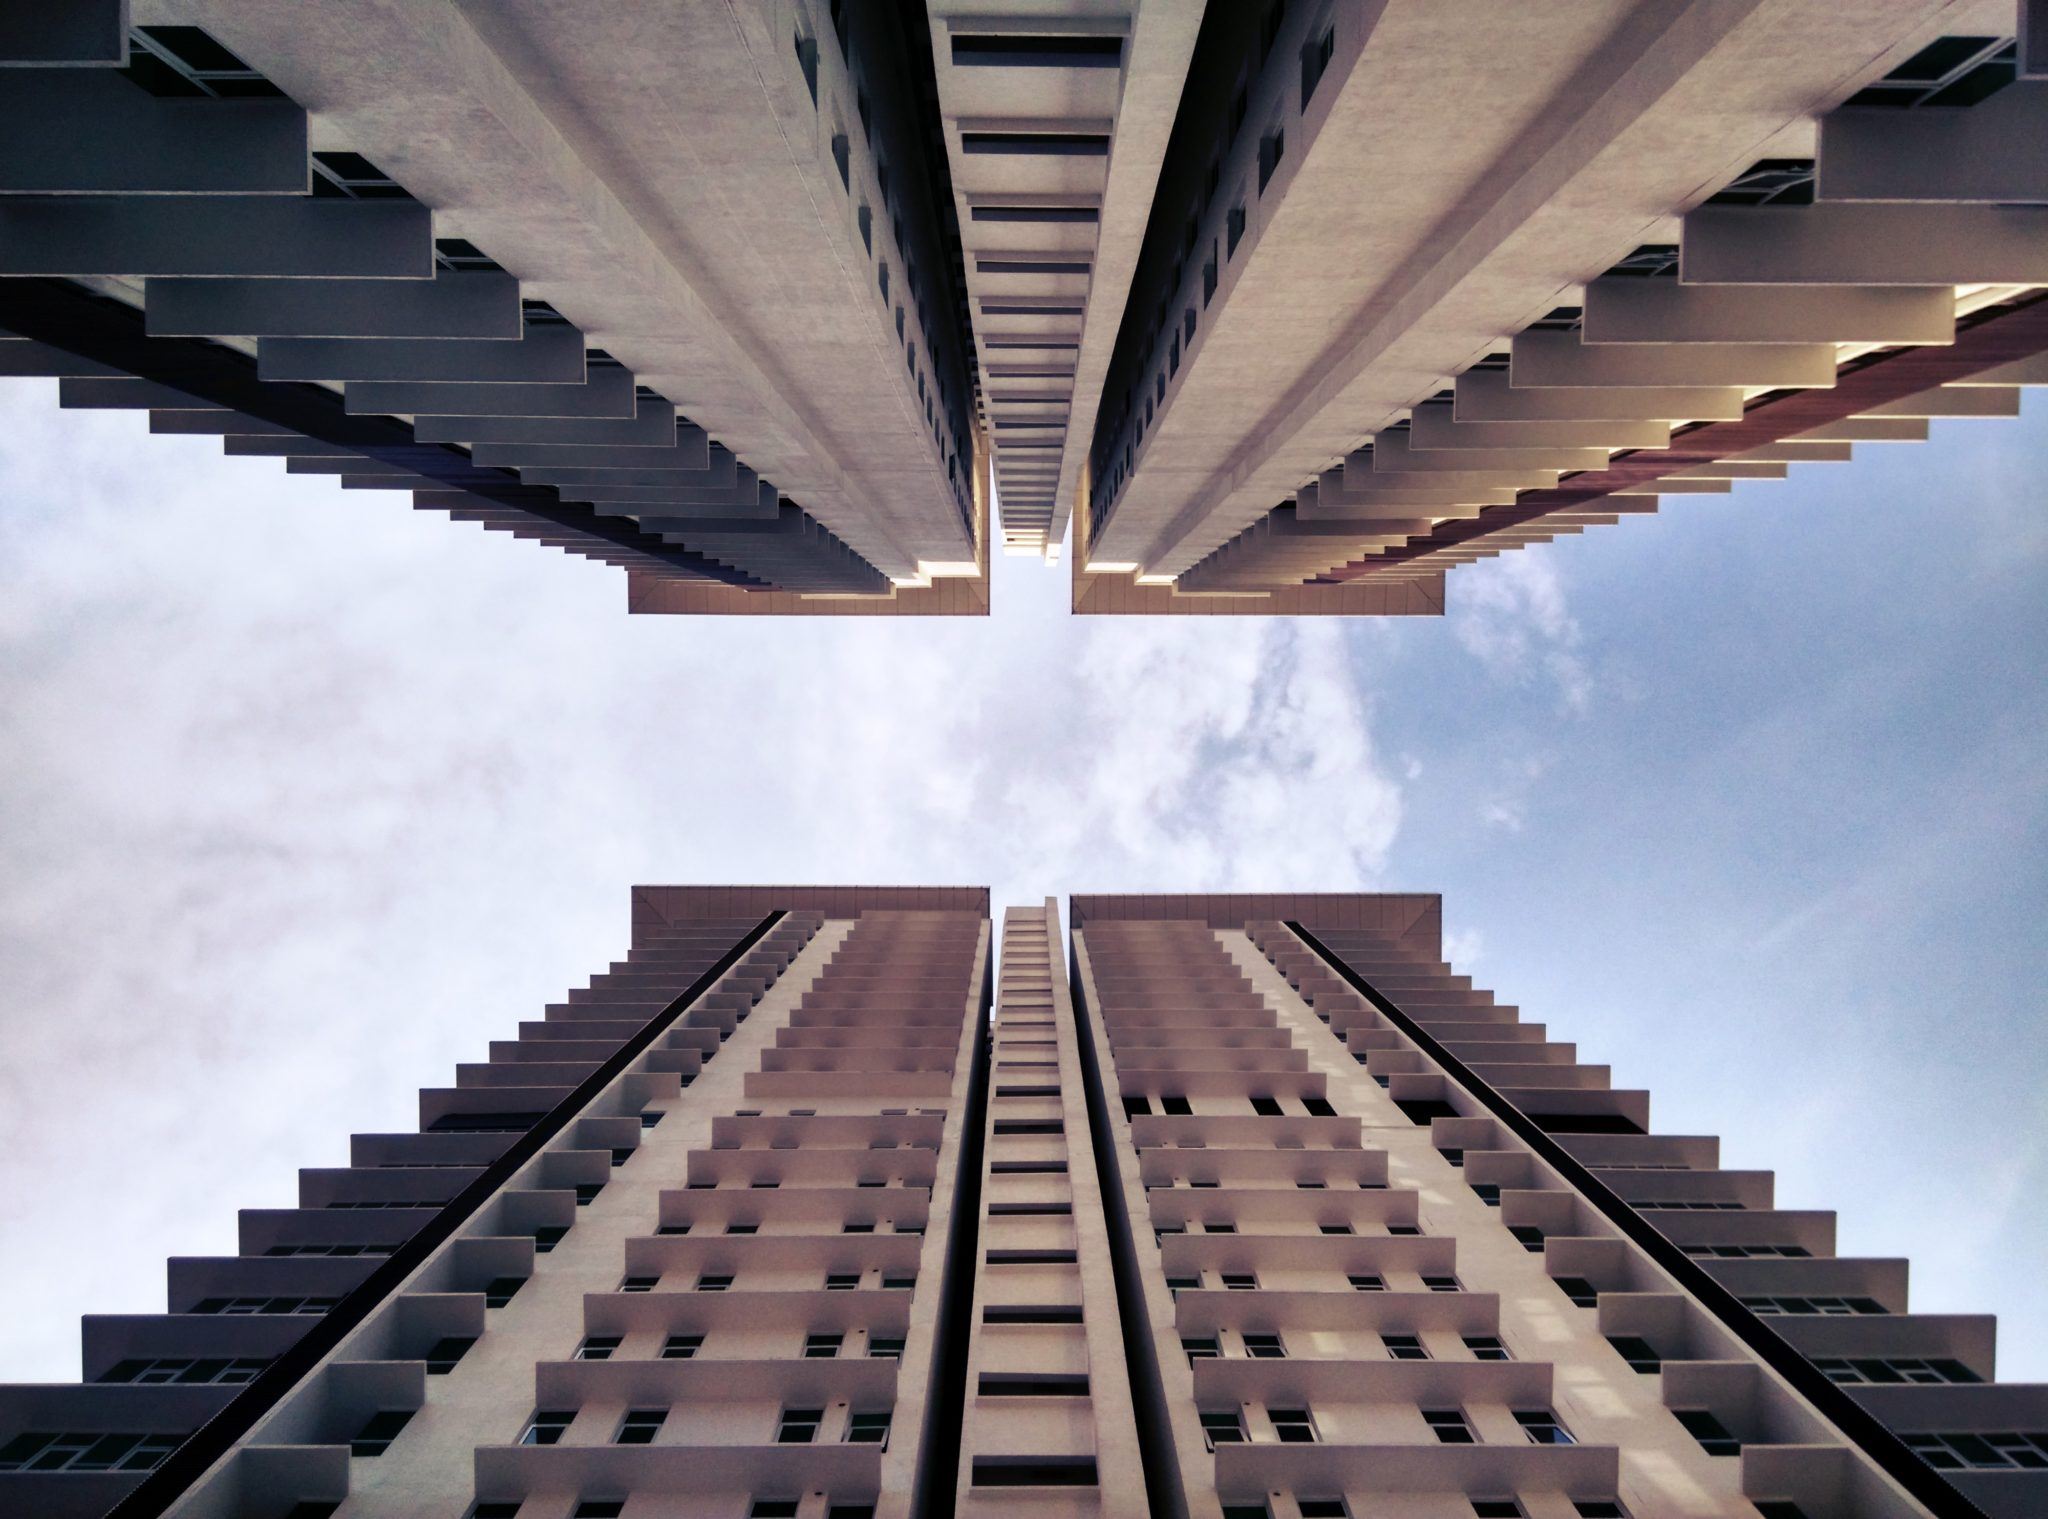 Las entidades bancarias deberán responder ante ingresos adelantados por viviendas no construidas